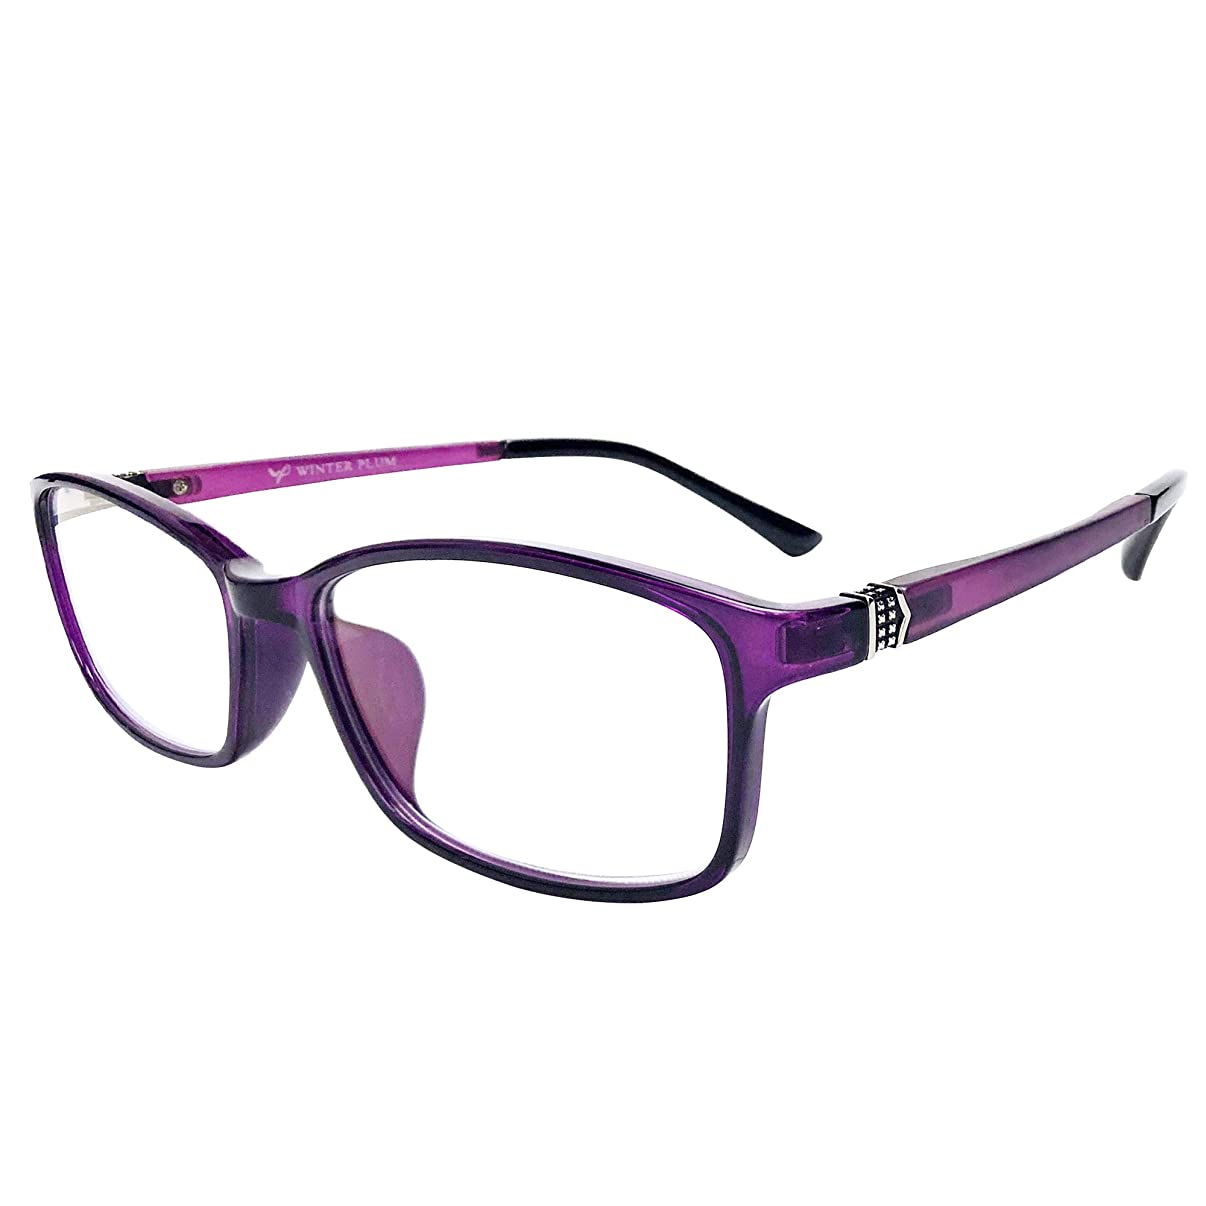 WINTER PLUM Reading Glasse,Blue Light Blocking Computer Glasses,Anti UV Glare Harmful for Men and Women(1601/Purple)